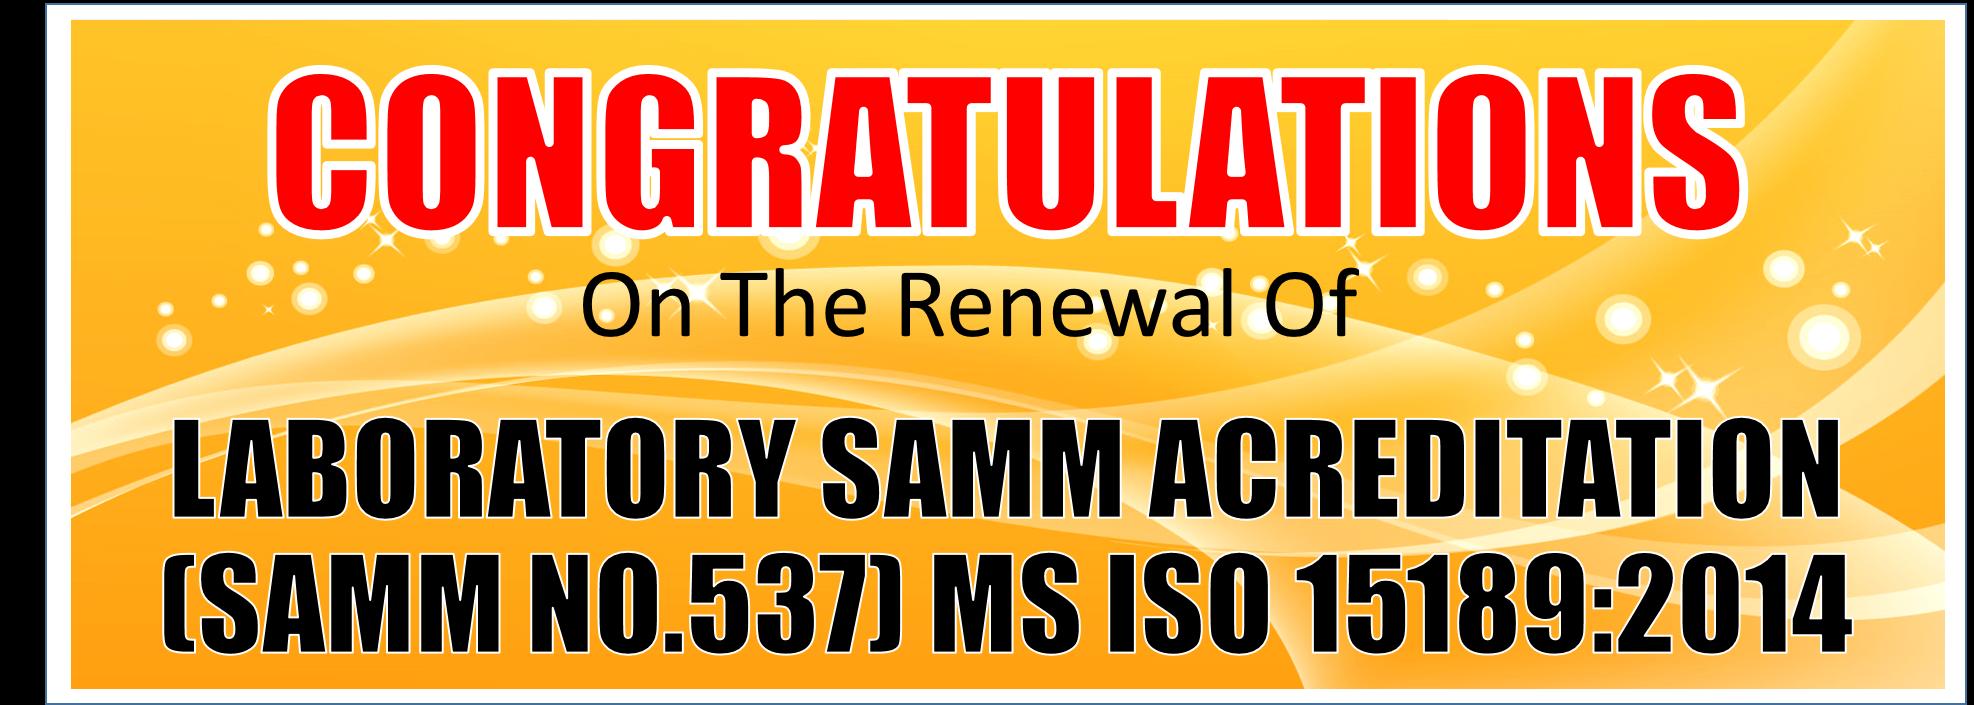 LABORATORY SAMM ACREDITATION(SAMM NO.537) MS ISO 15189:2014